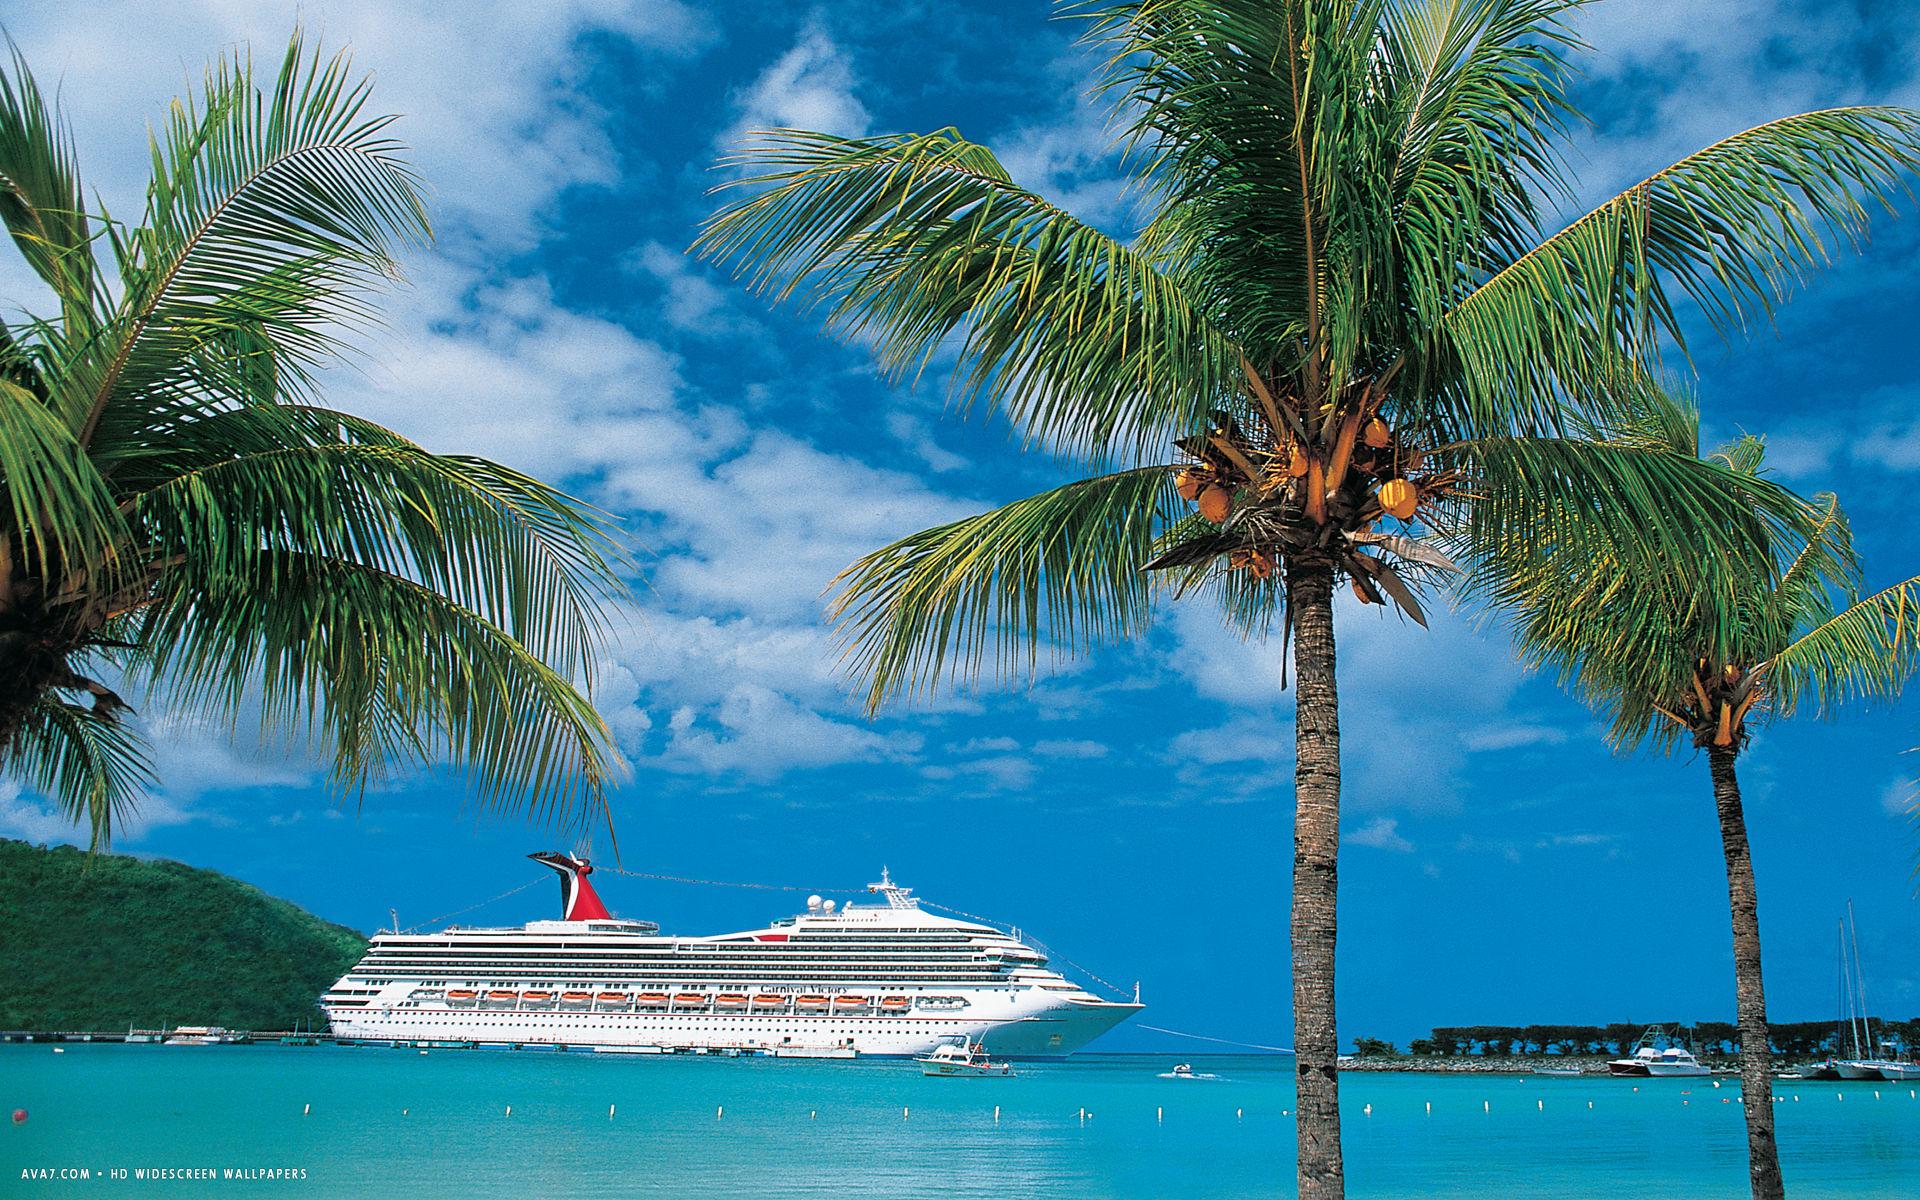 carnival victory cruise ship hd widescreen wallpaper cruise ships 1920x1200